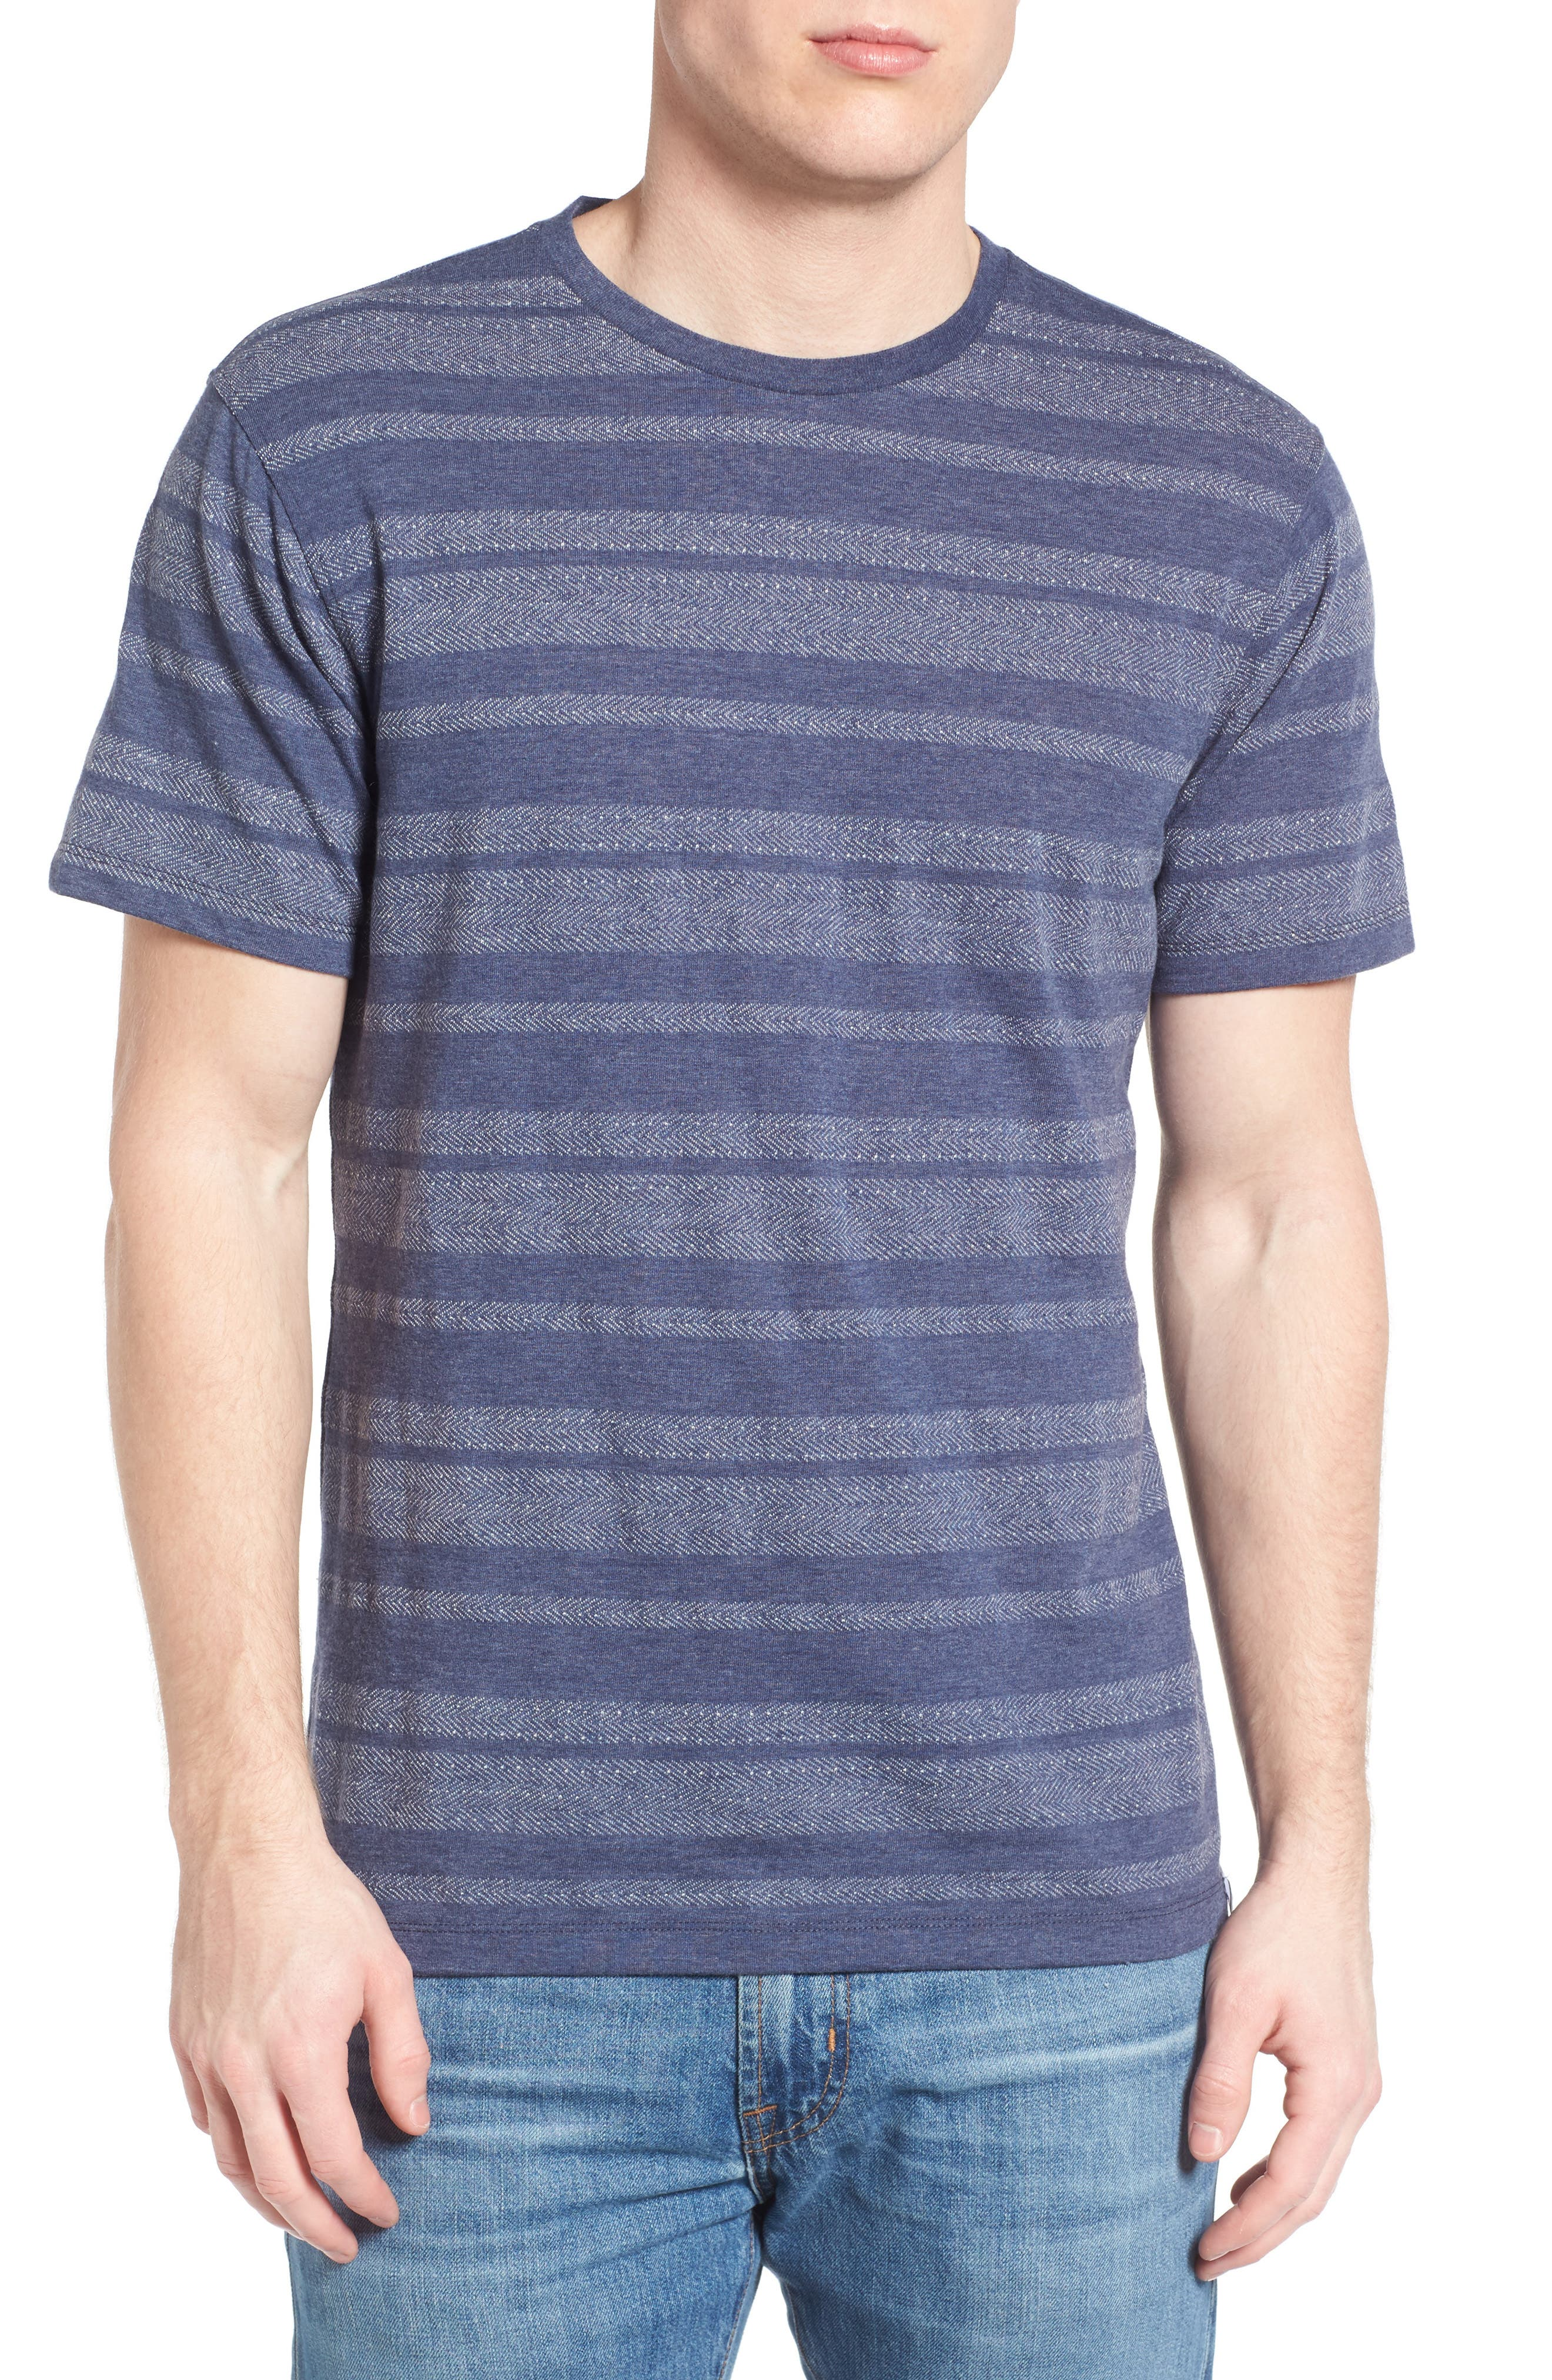 1901 Jacquard Stripe Crewneck T-Shirt